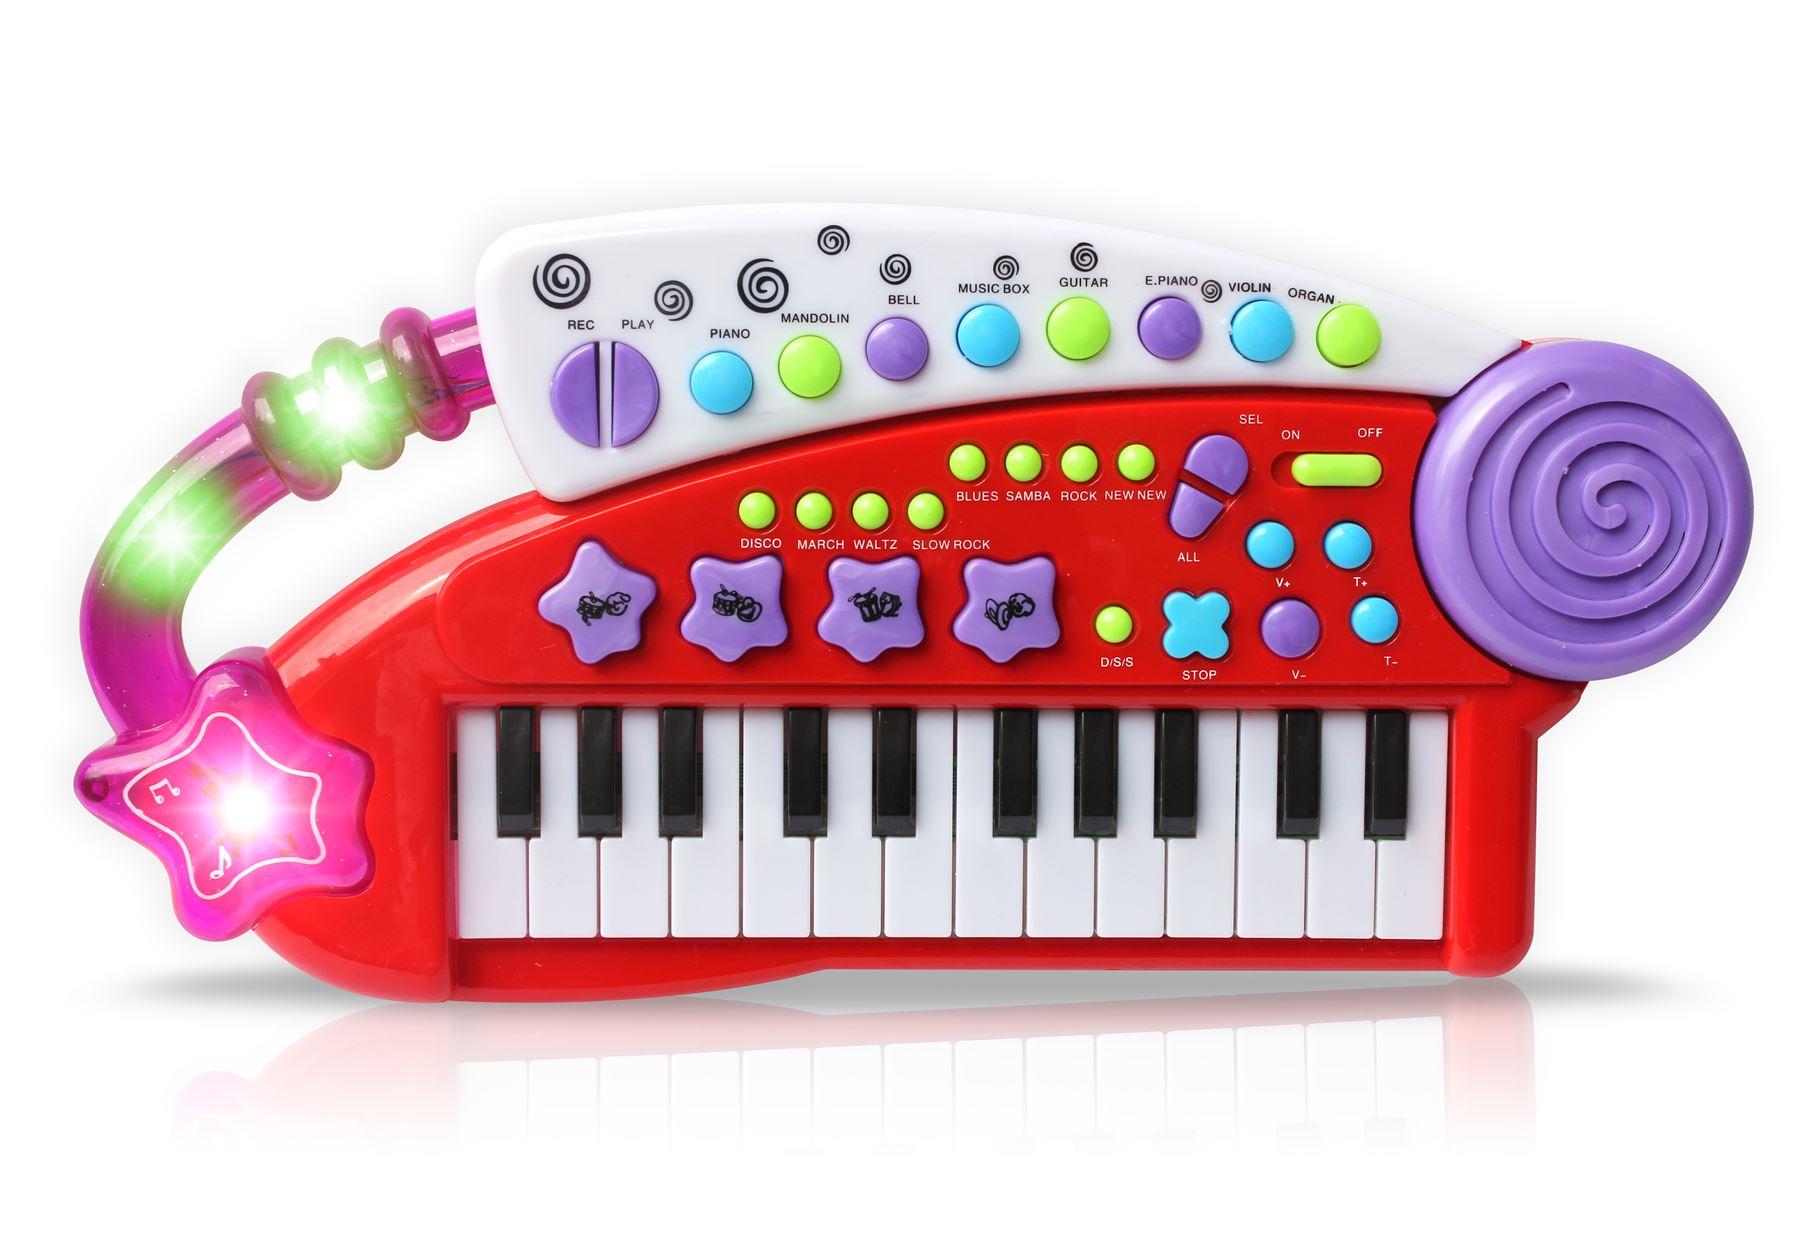 Vinsani Piano Carry Along Keyboard Children Kids Musical